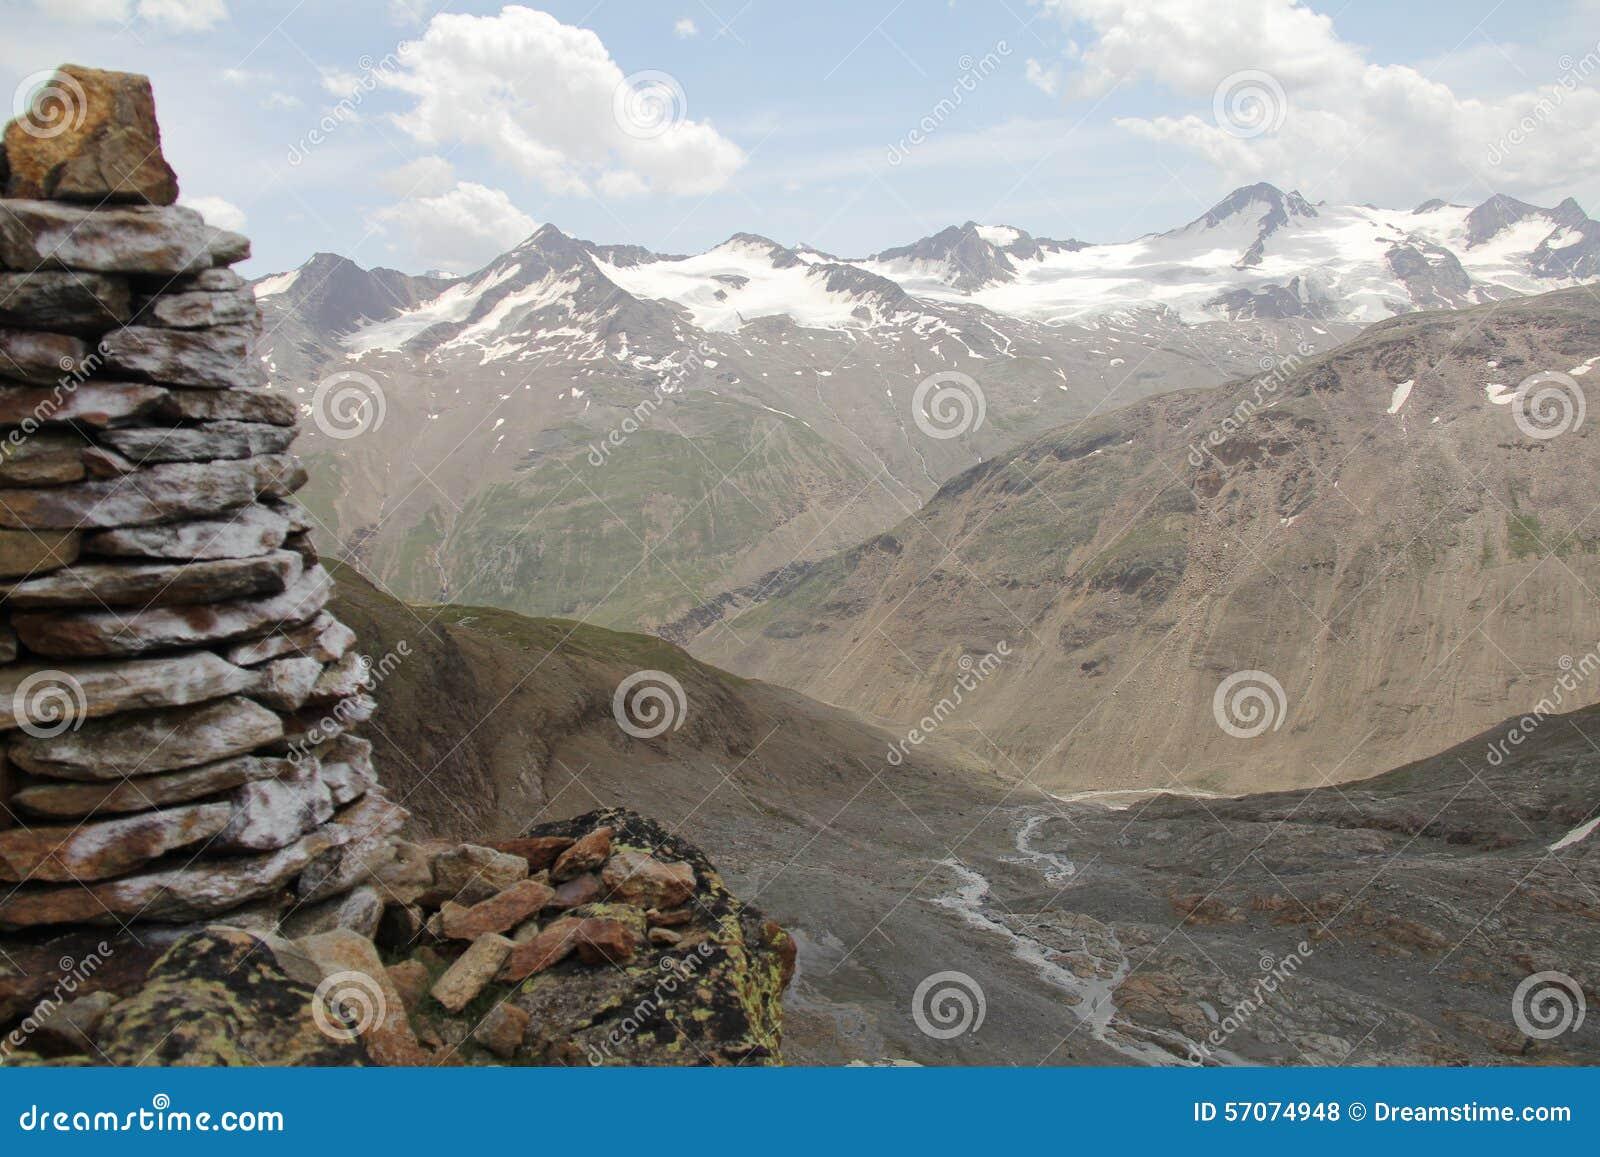 Bergpanorama in otztal alpen, Oostenrijk